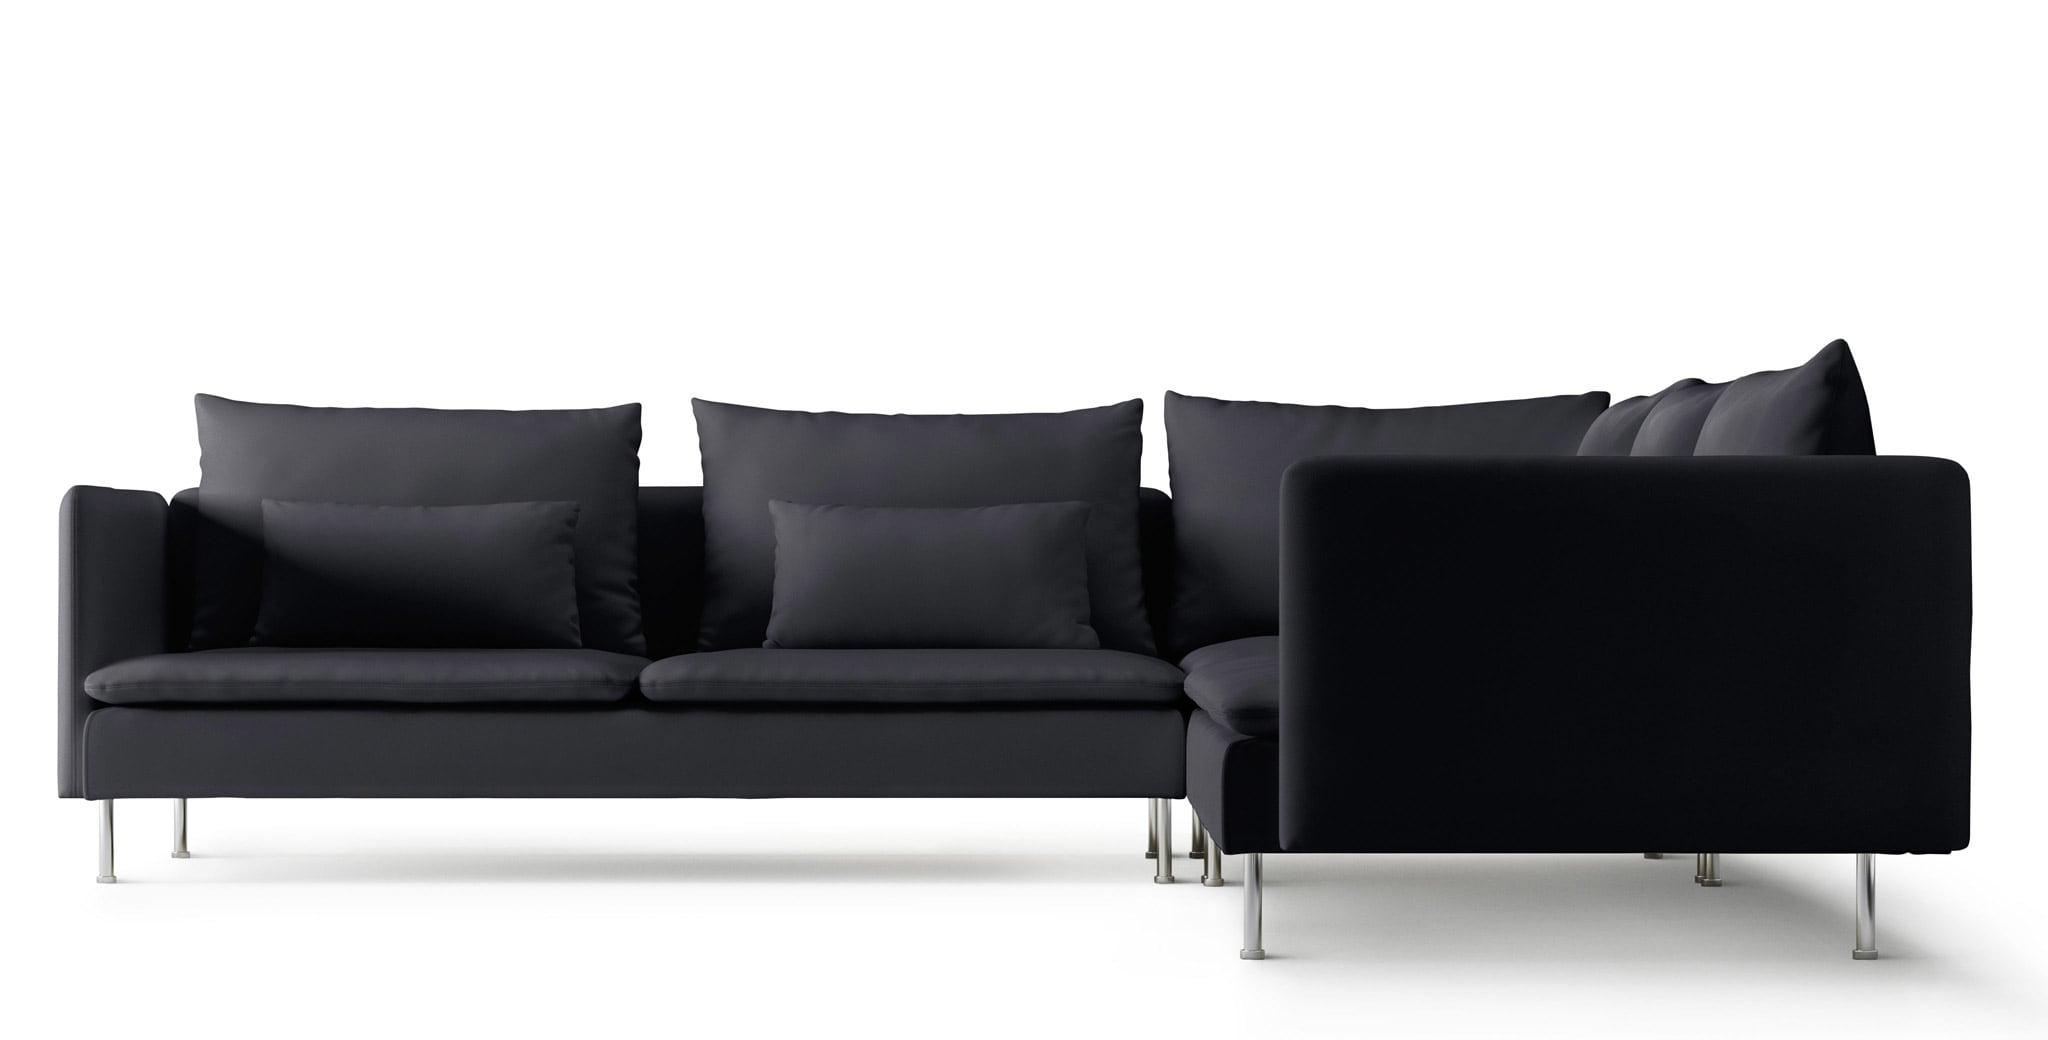 Ikea Fabric Corner Sofas | Ireland – Dublin Inside Lucy Dark Grey Sofa Chairs (Image 10 of 25)